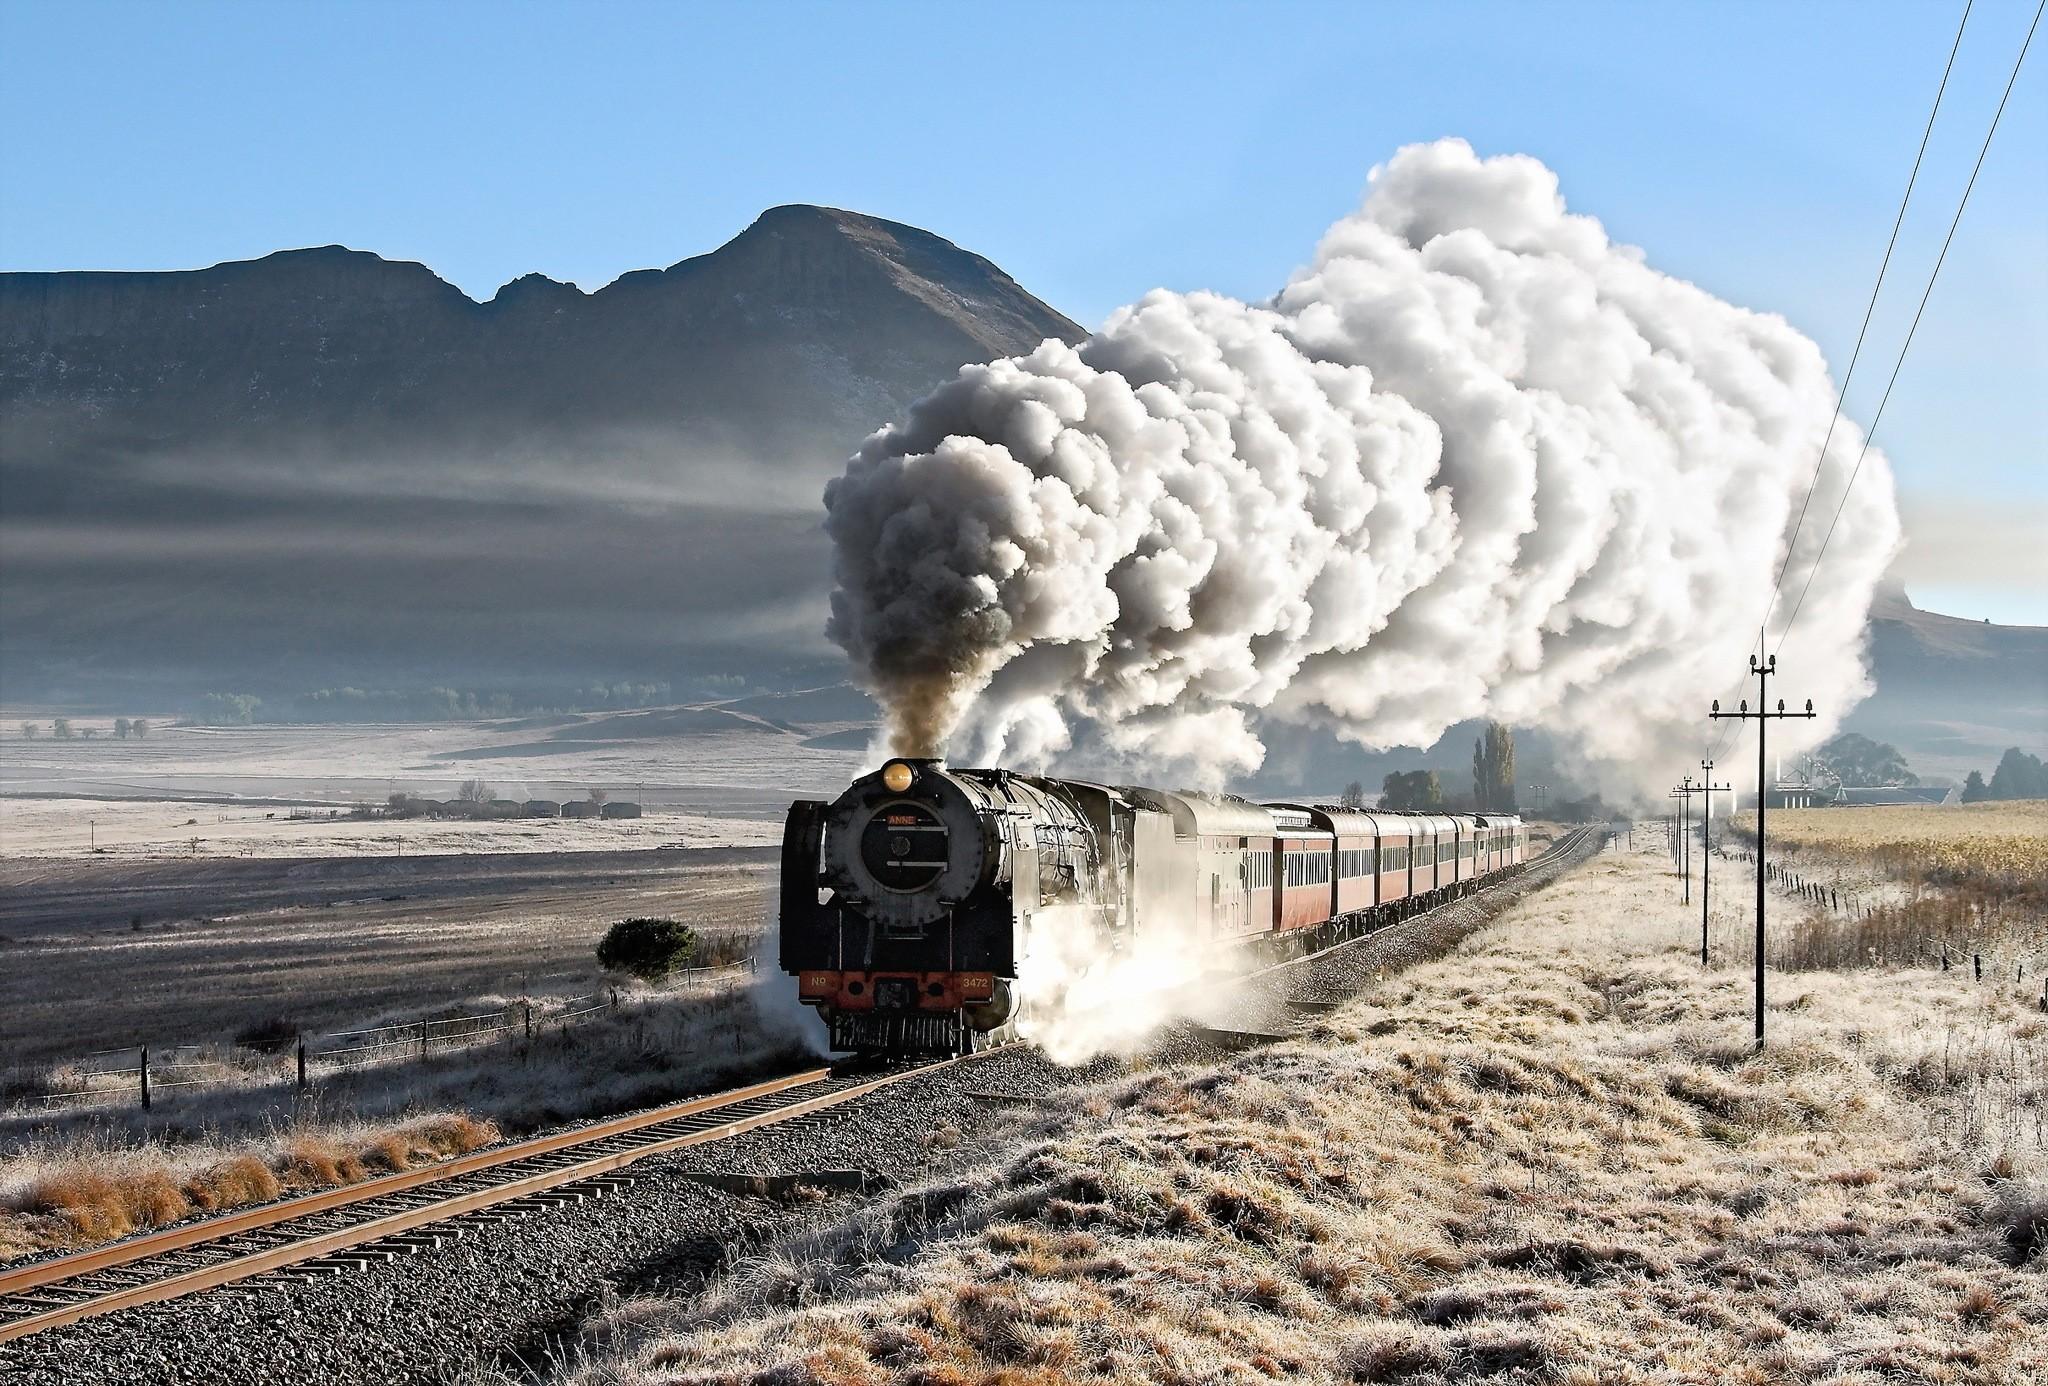 Wallpaper Landscape Sky Vehicle Smoke Train Railway